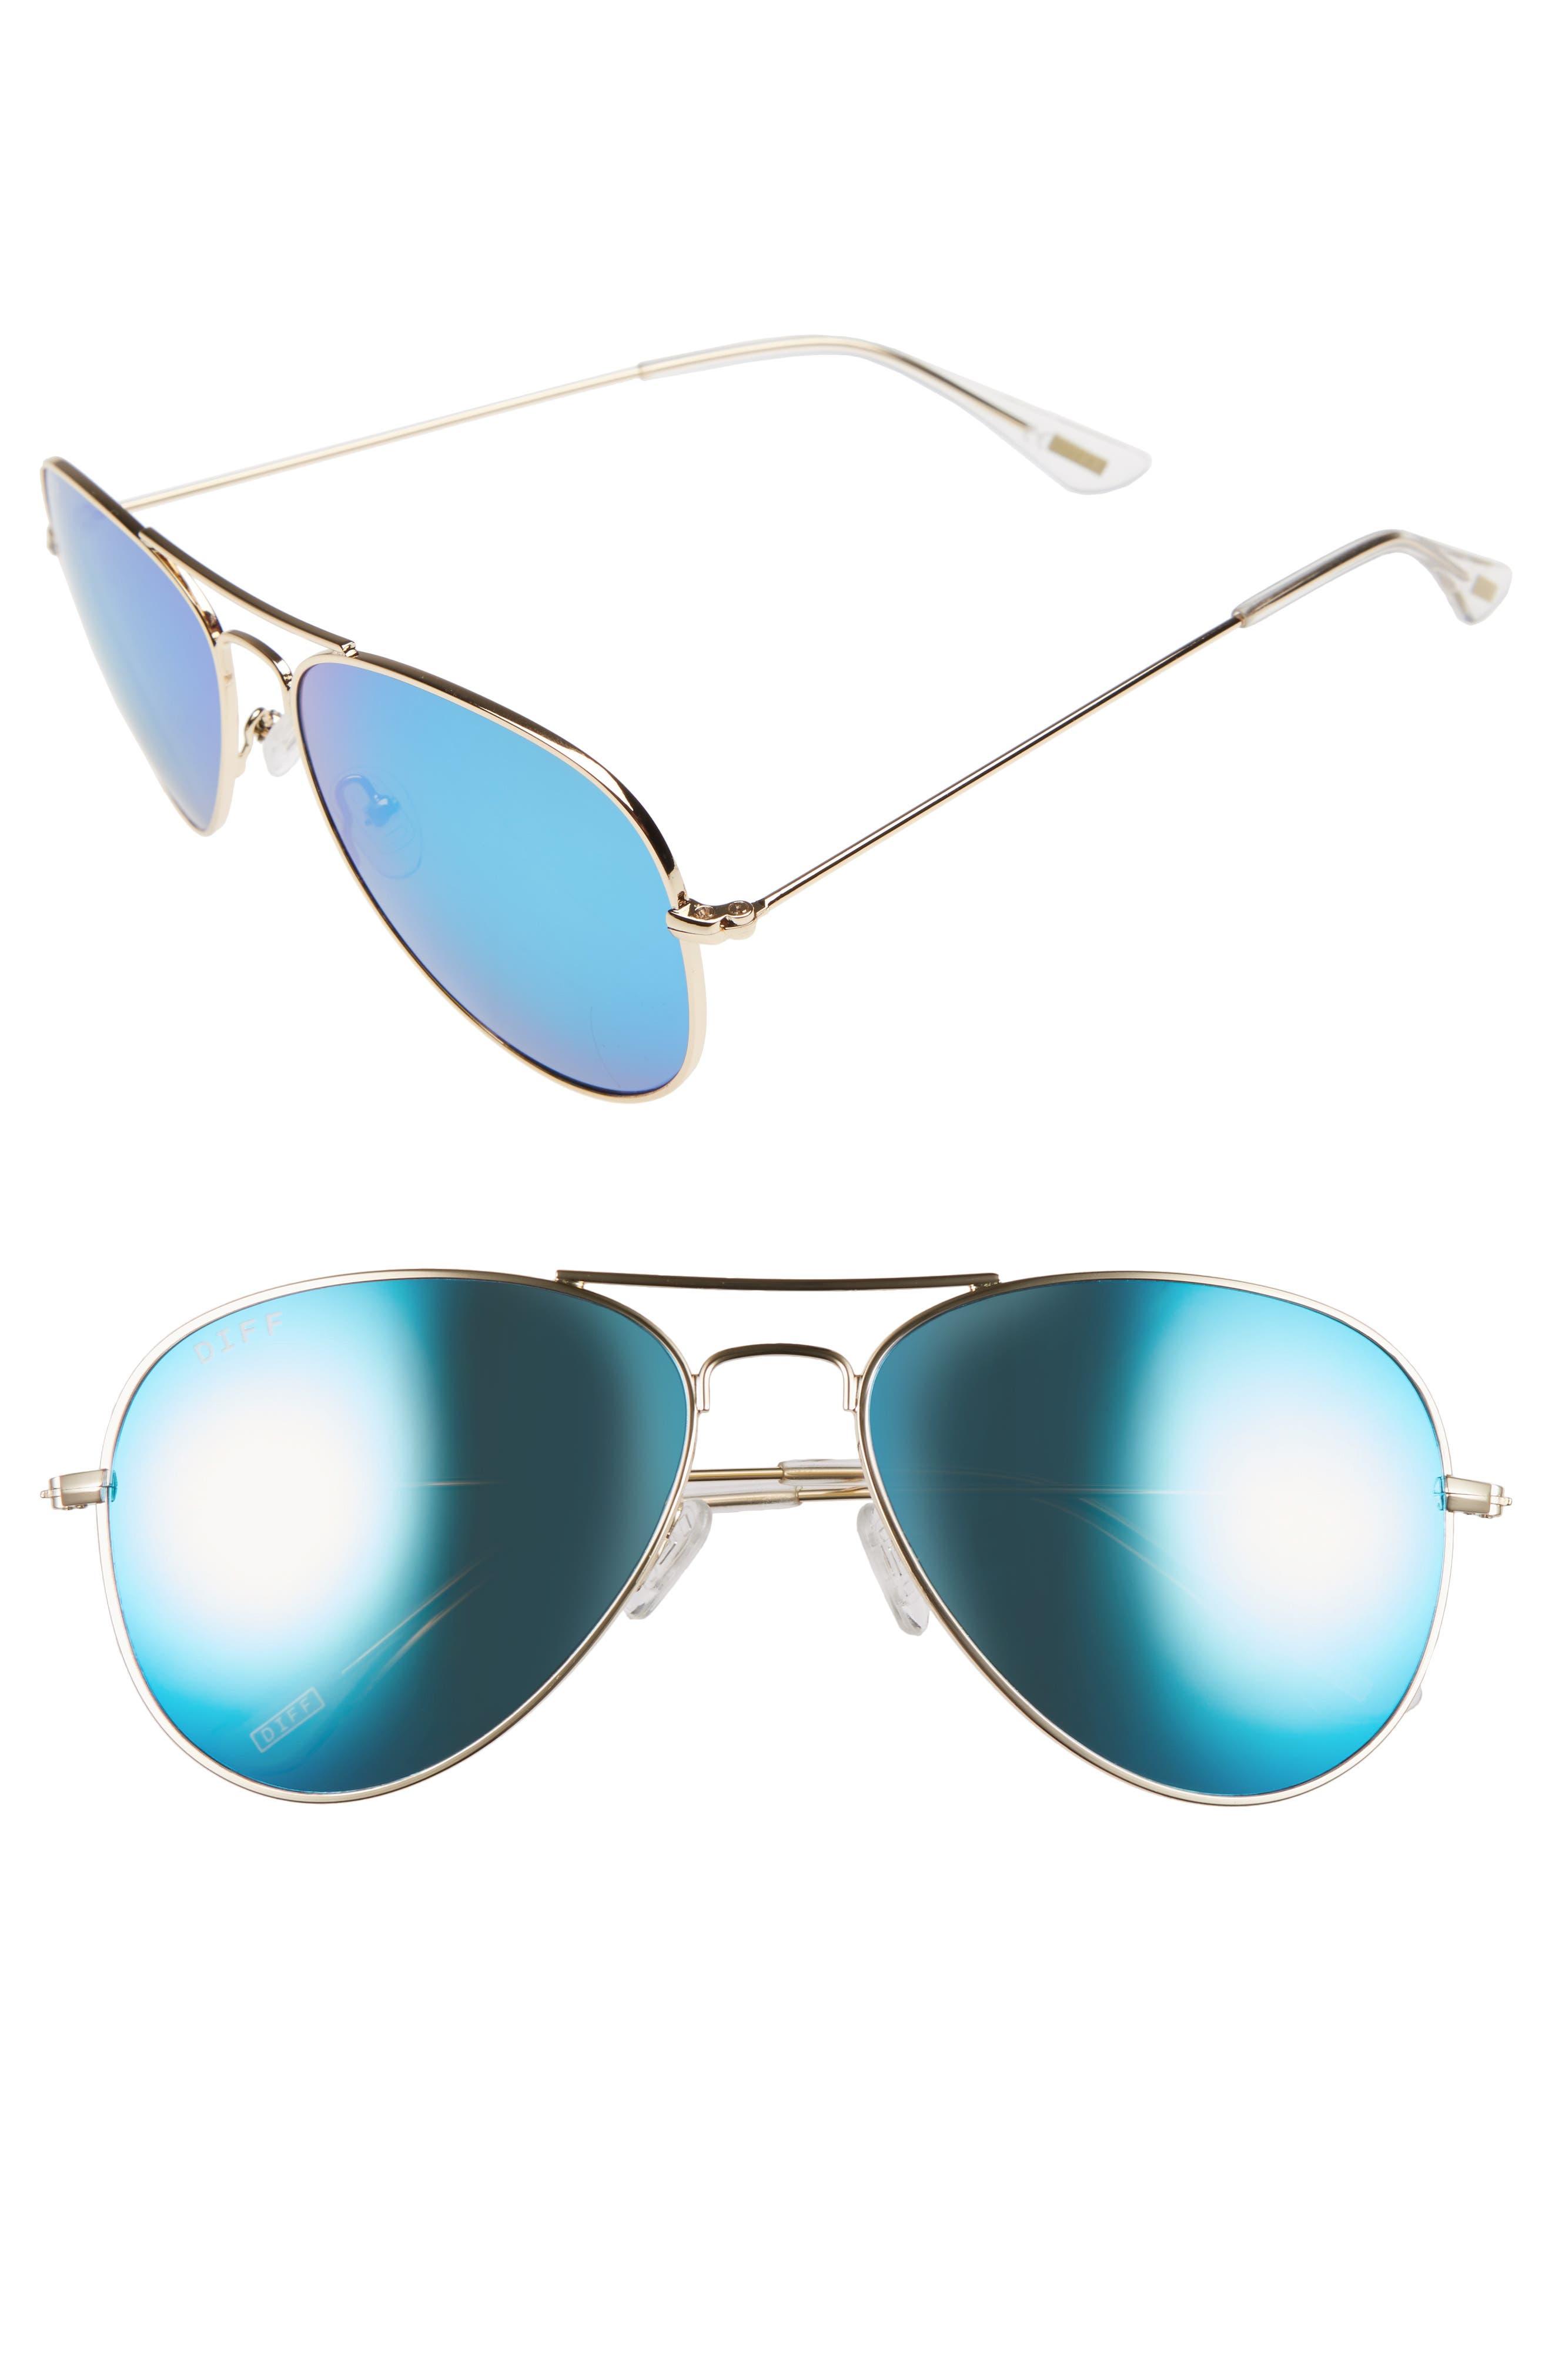 Cruz 57mm Metal Aviator Sunglasses,                             Main thumbnail 1, color,                             GOLD/ BLUE